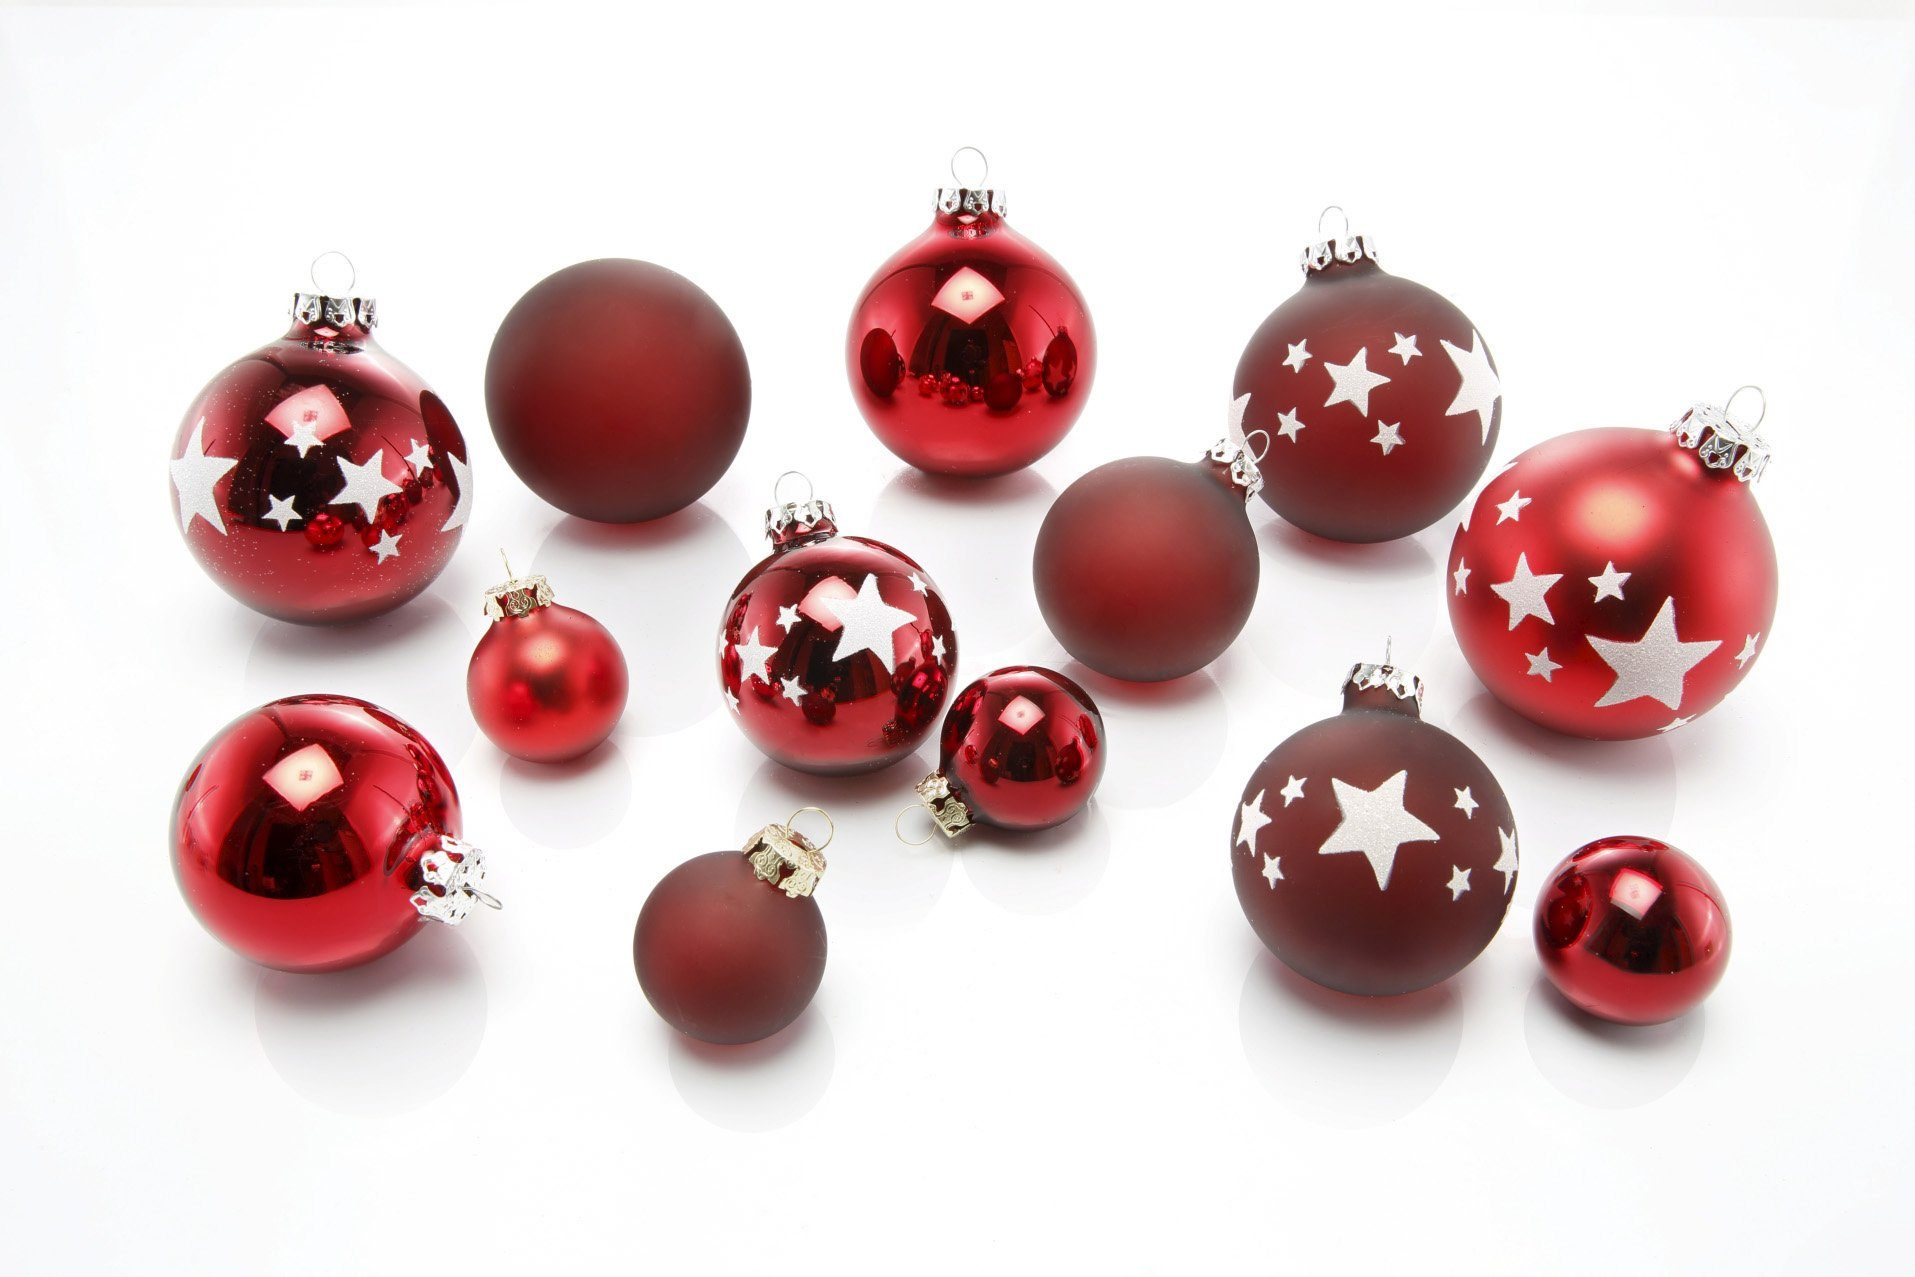 Thüringer Glasdesign TGS-Weihnachtskugeln, Made in Germany, »Advent« (30tlg.)